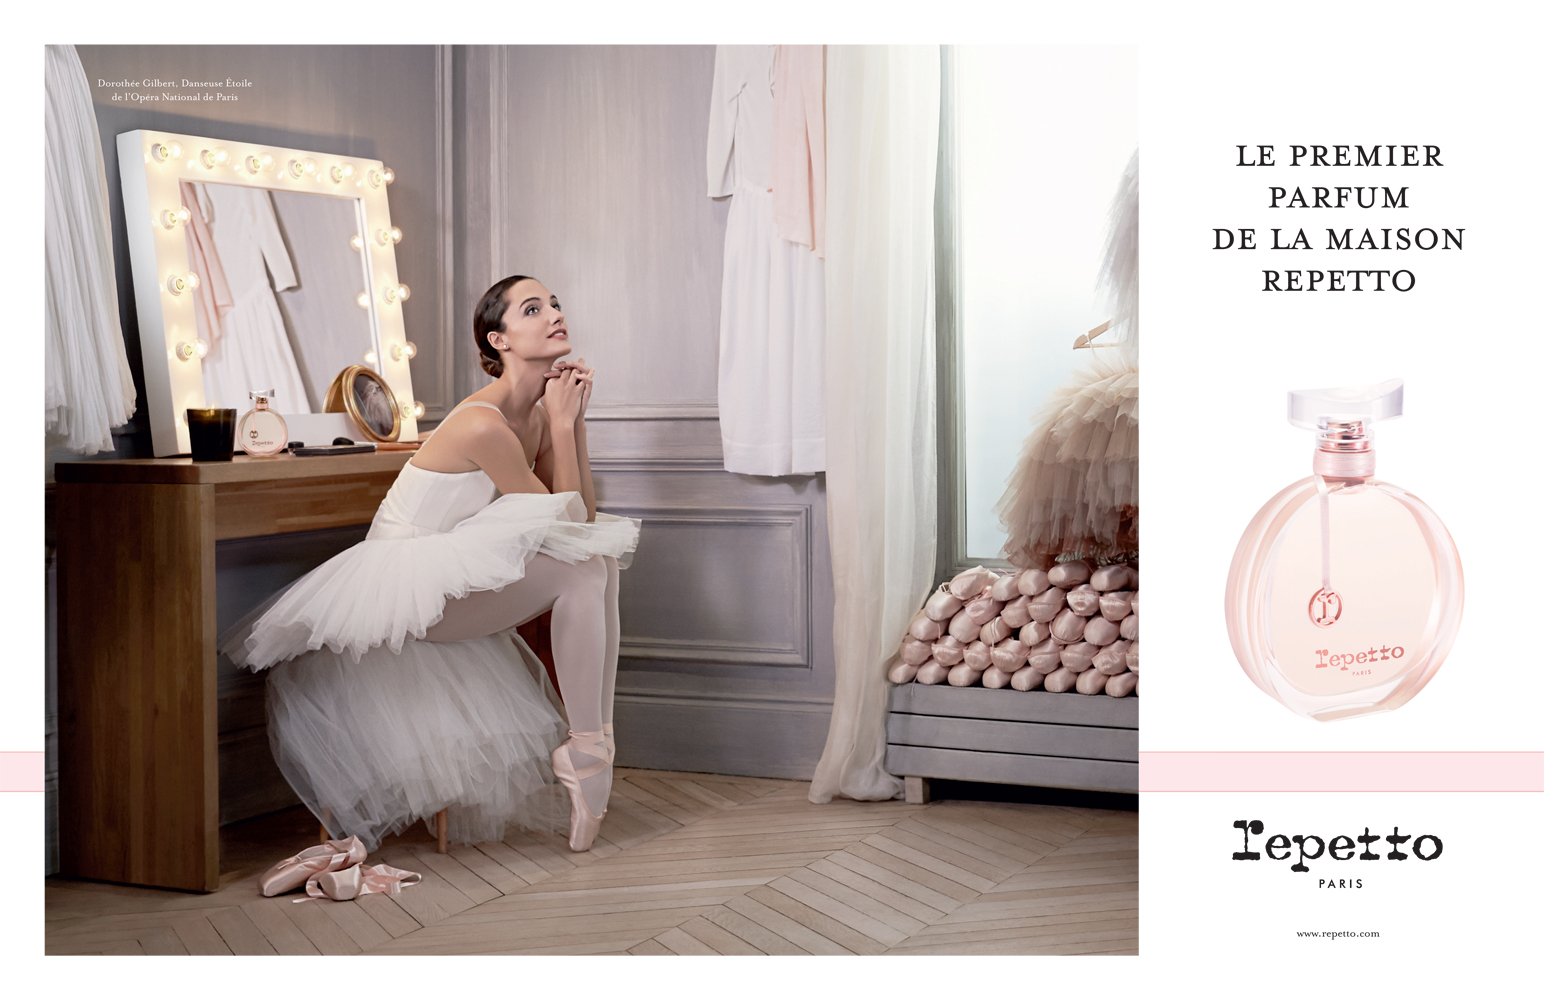 Repetto Parfum – Framboisemood BeautéLe uKF3l1cJT